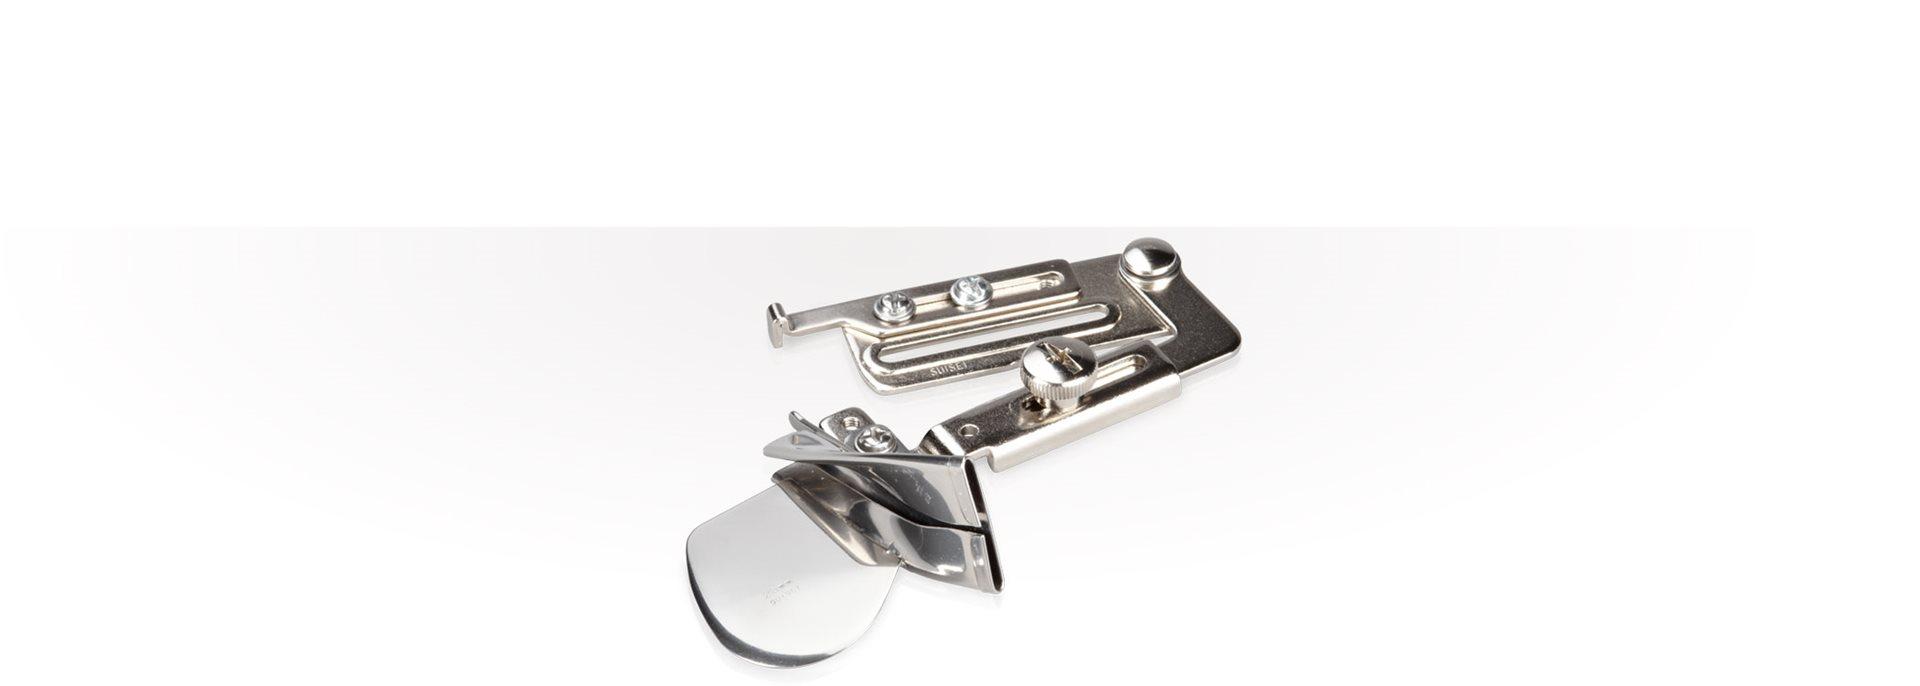 Bernina #87 25mm Binder Attachment